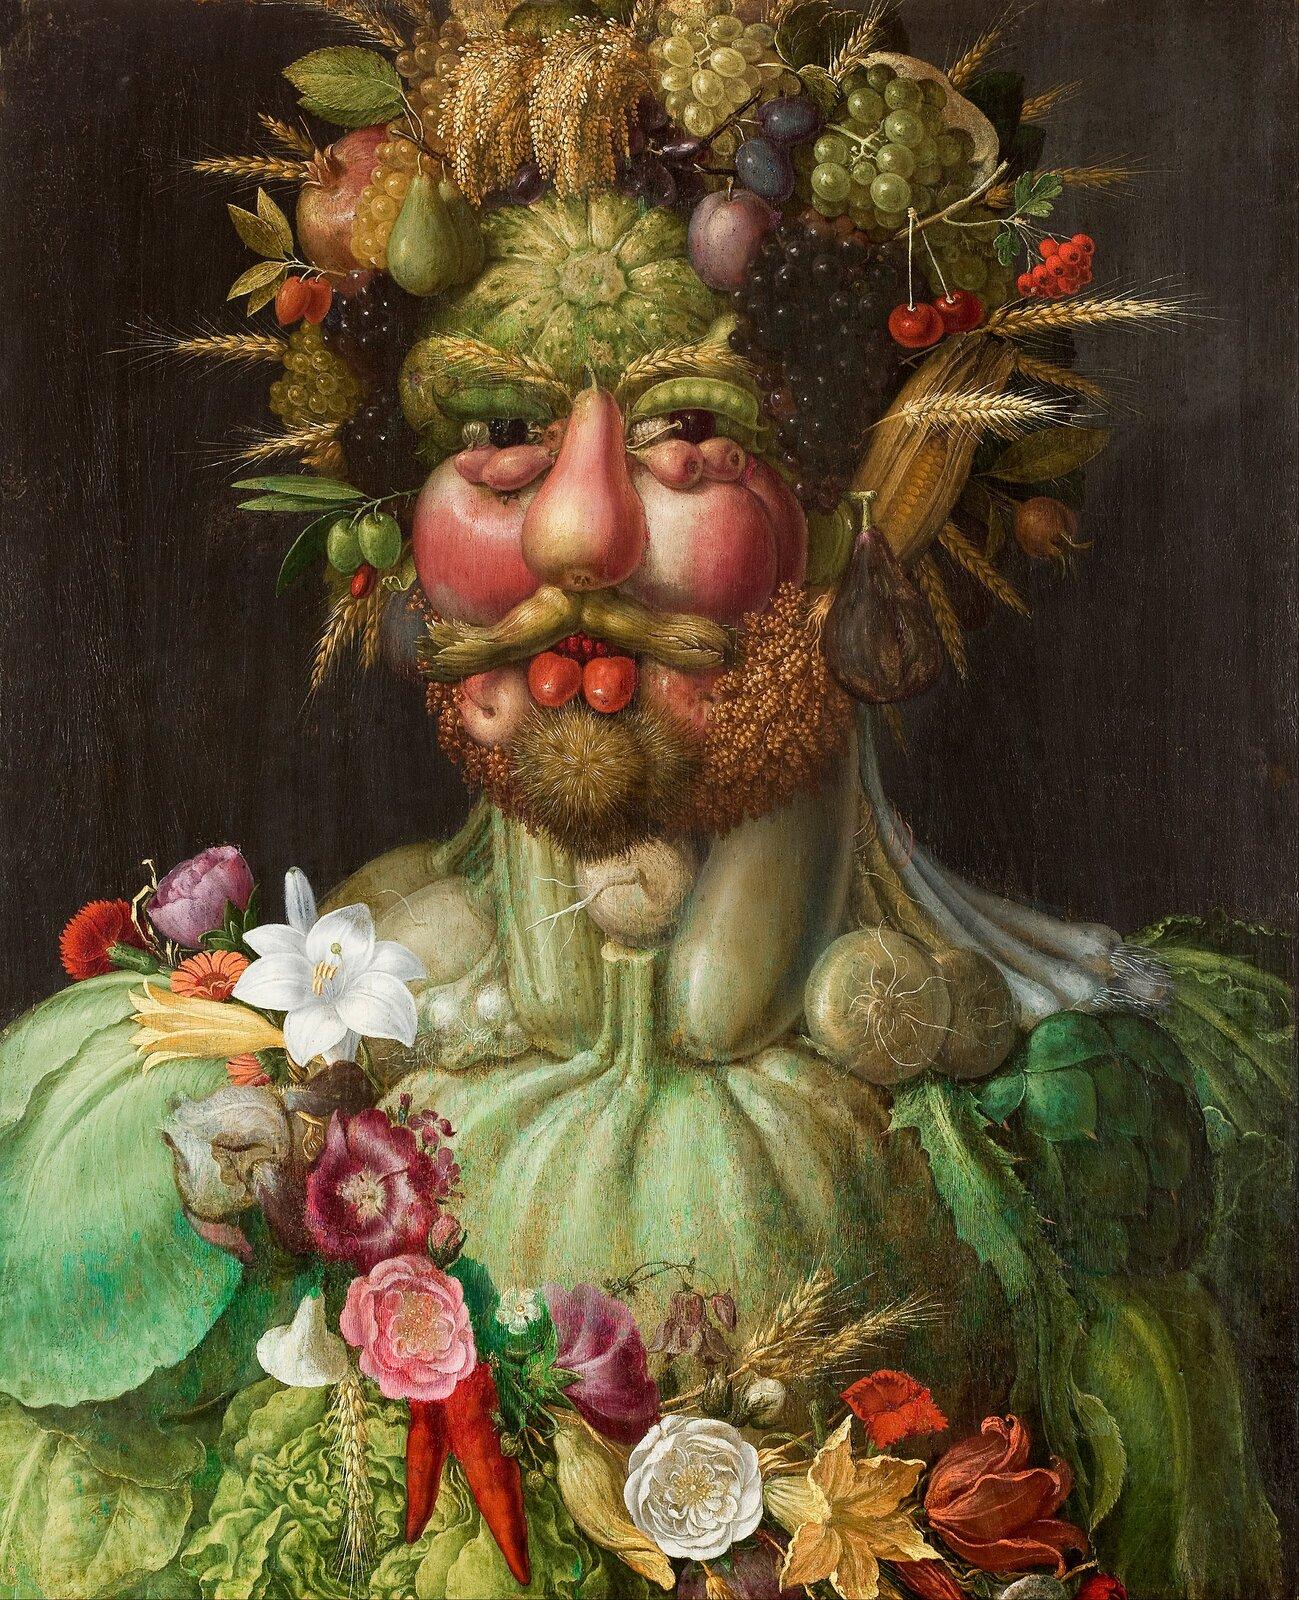 Cesarz Rudolf II Habsburg jako Wertumnus Źródło: Giuseppe Arcimboldo, Cesarz Rudolf II Habsburg jako Wertumnus, 1590, olej na desce, domena publiczna.